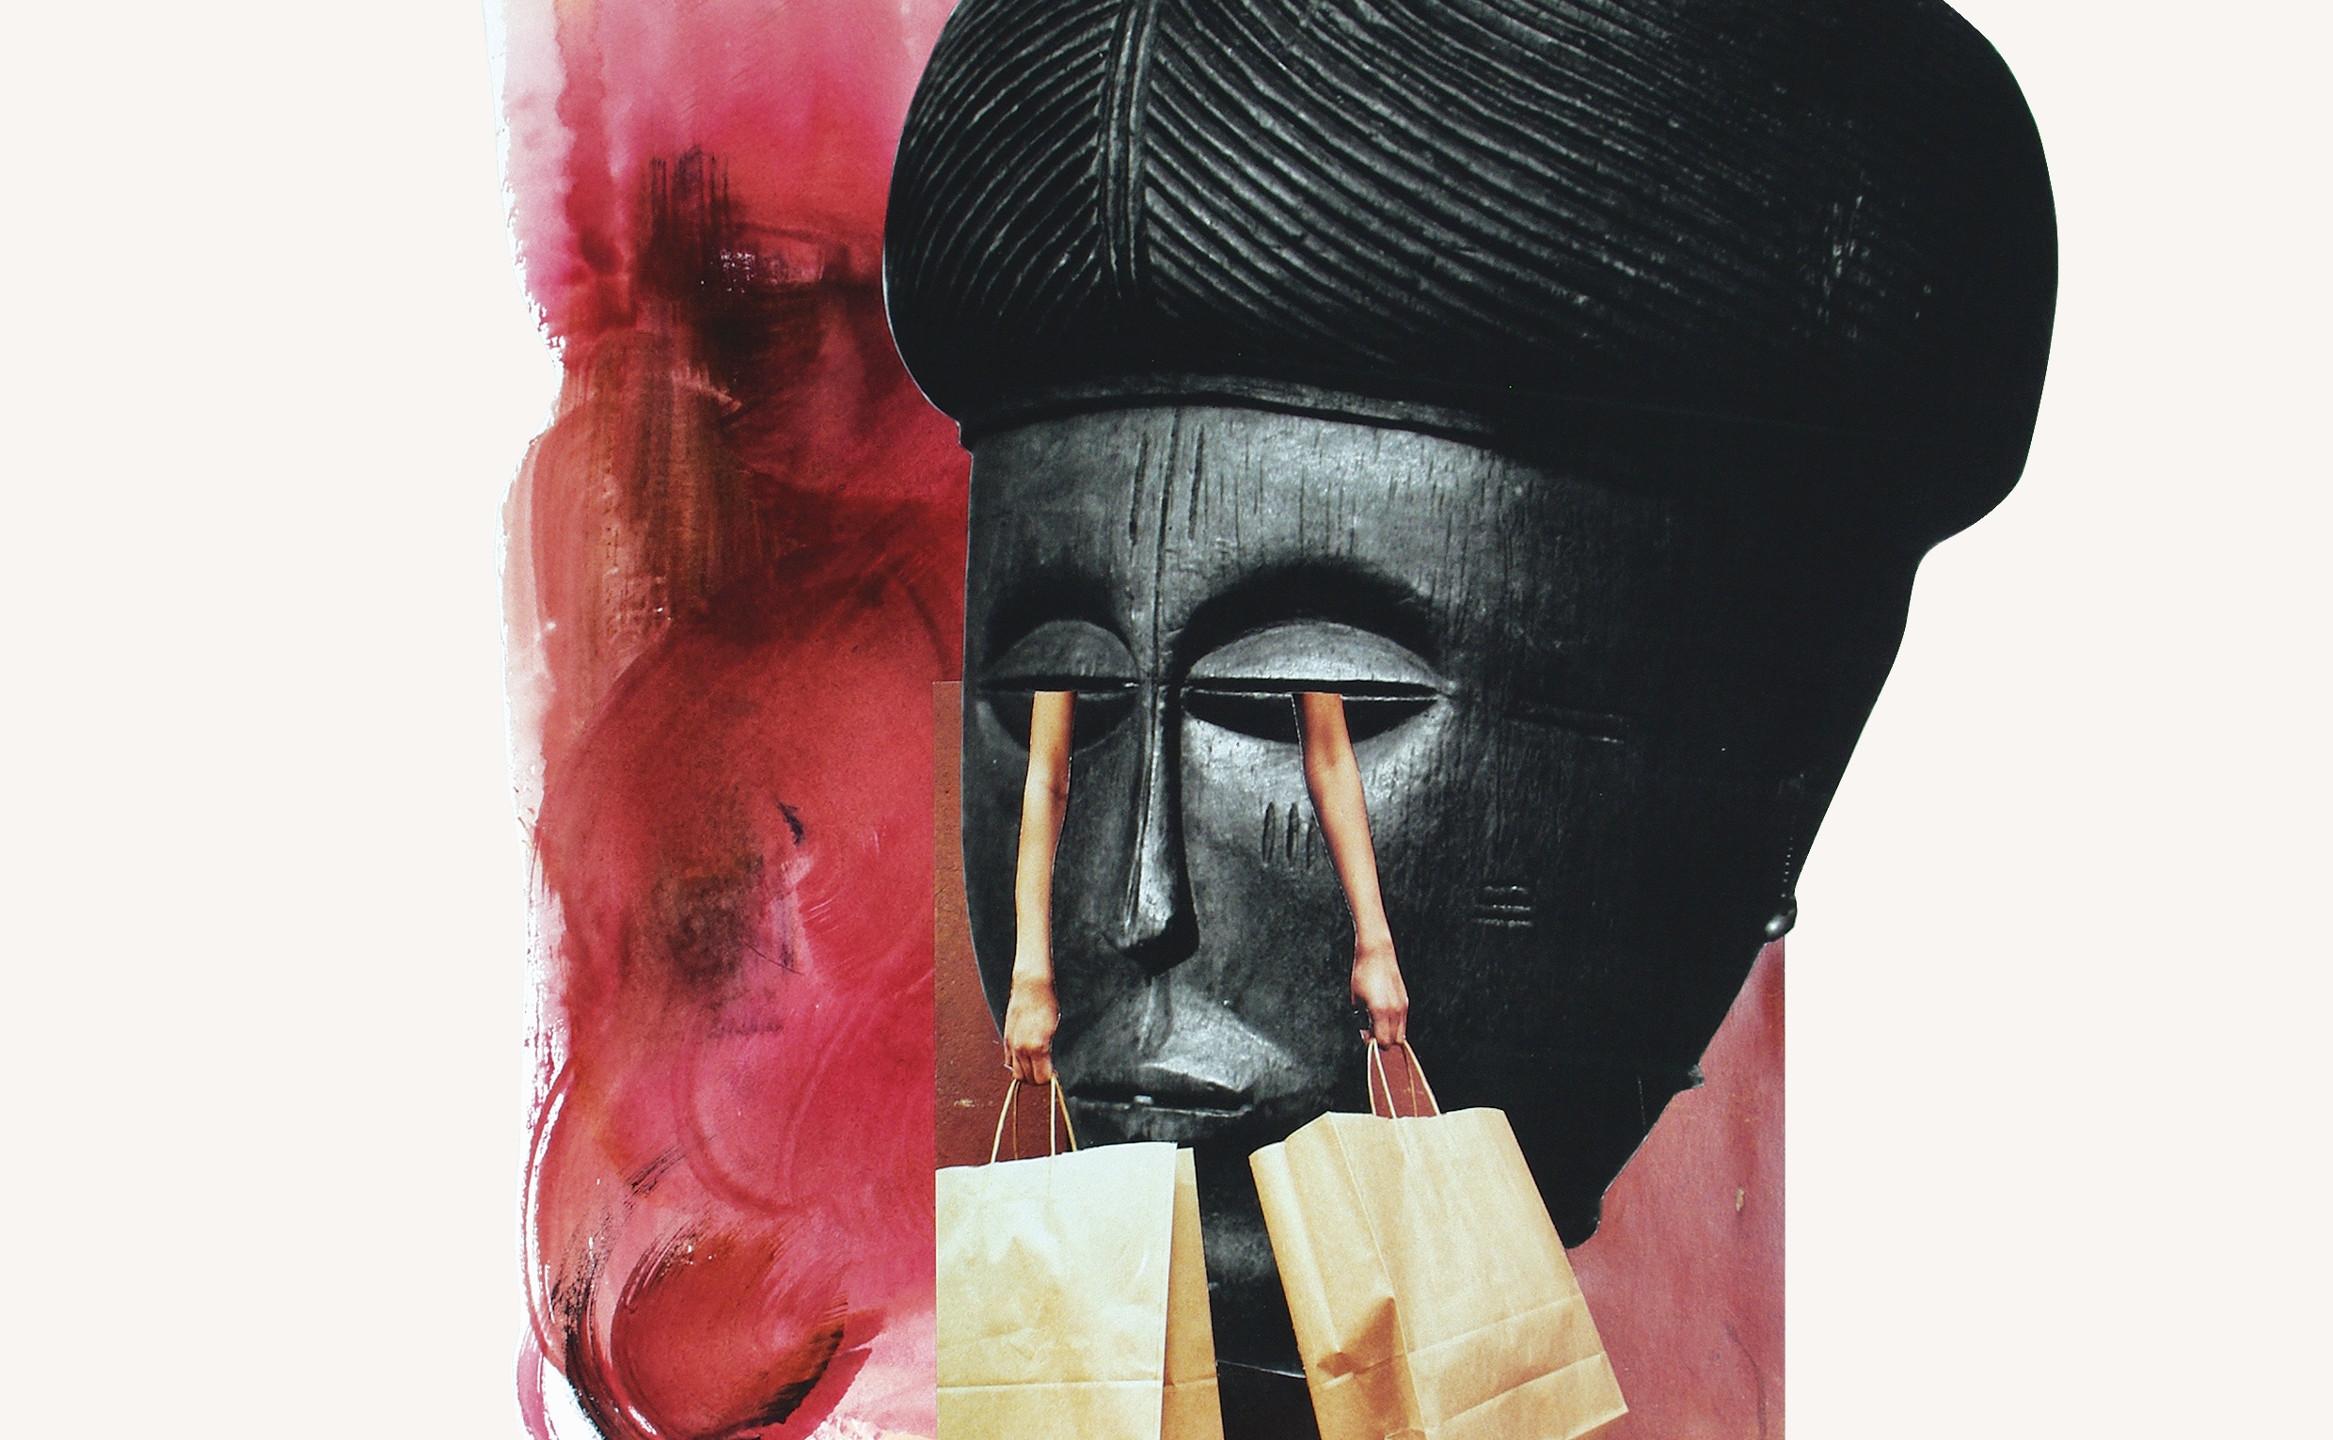 Crybaby, Larita Engelbrecht, Mixed Media Collage on Paper, 48 x 37cm (2333x3000)